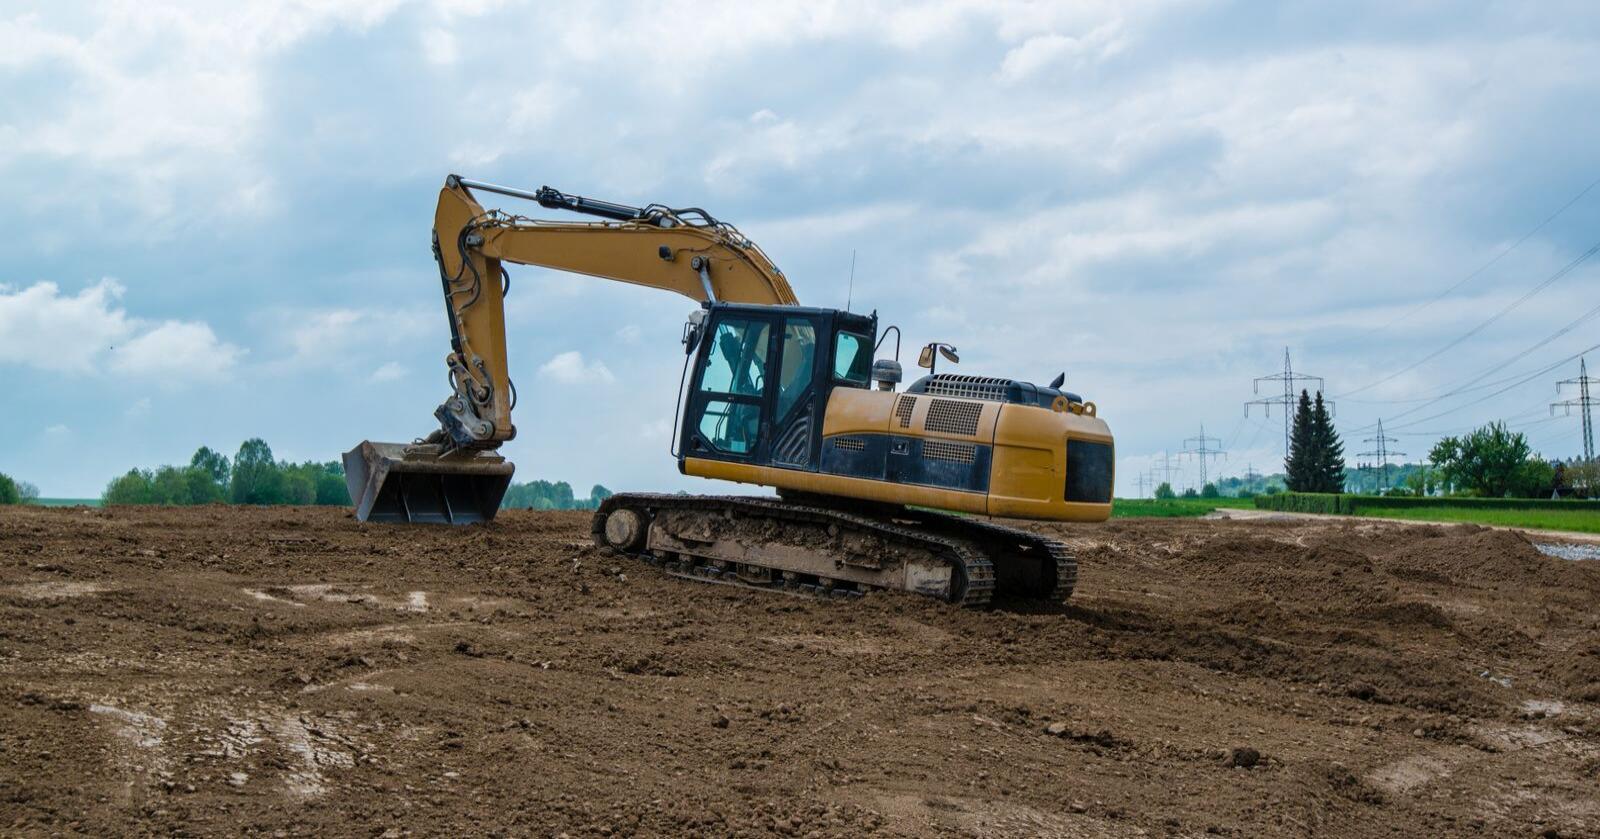 Nedbyggingen av dyrka jord har gått ned i seinere år. Sp foreslår nå et skjerpet jordvernmål, slik at maksimal tillatt nedbygging årlig halveres fra dagens mål. Foto: Mostphotos